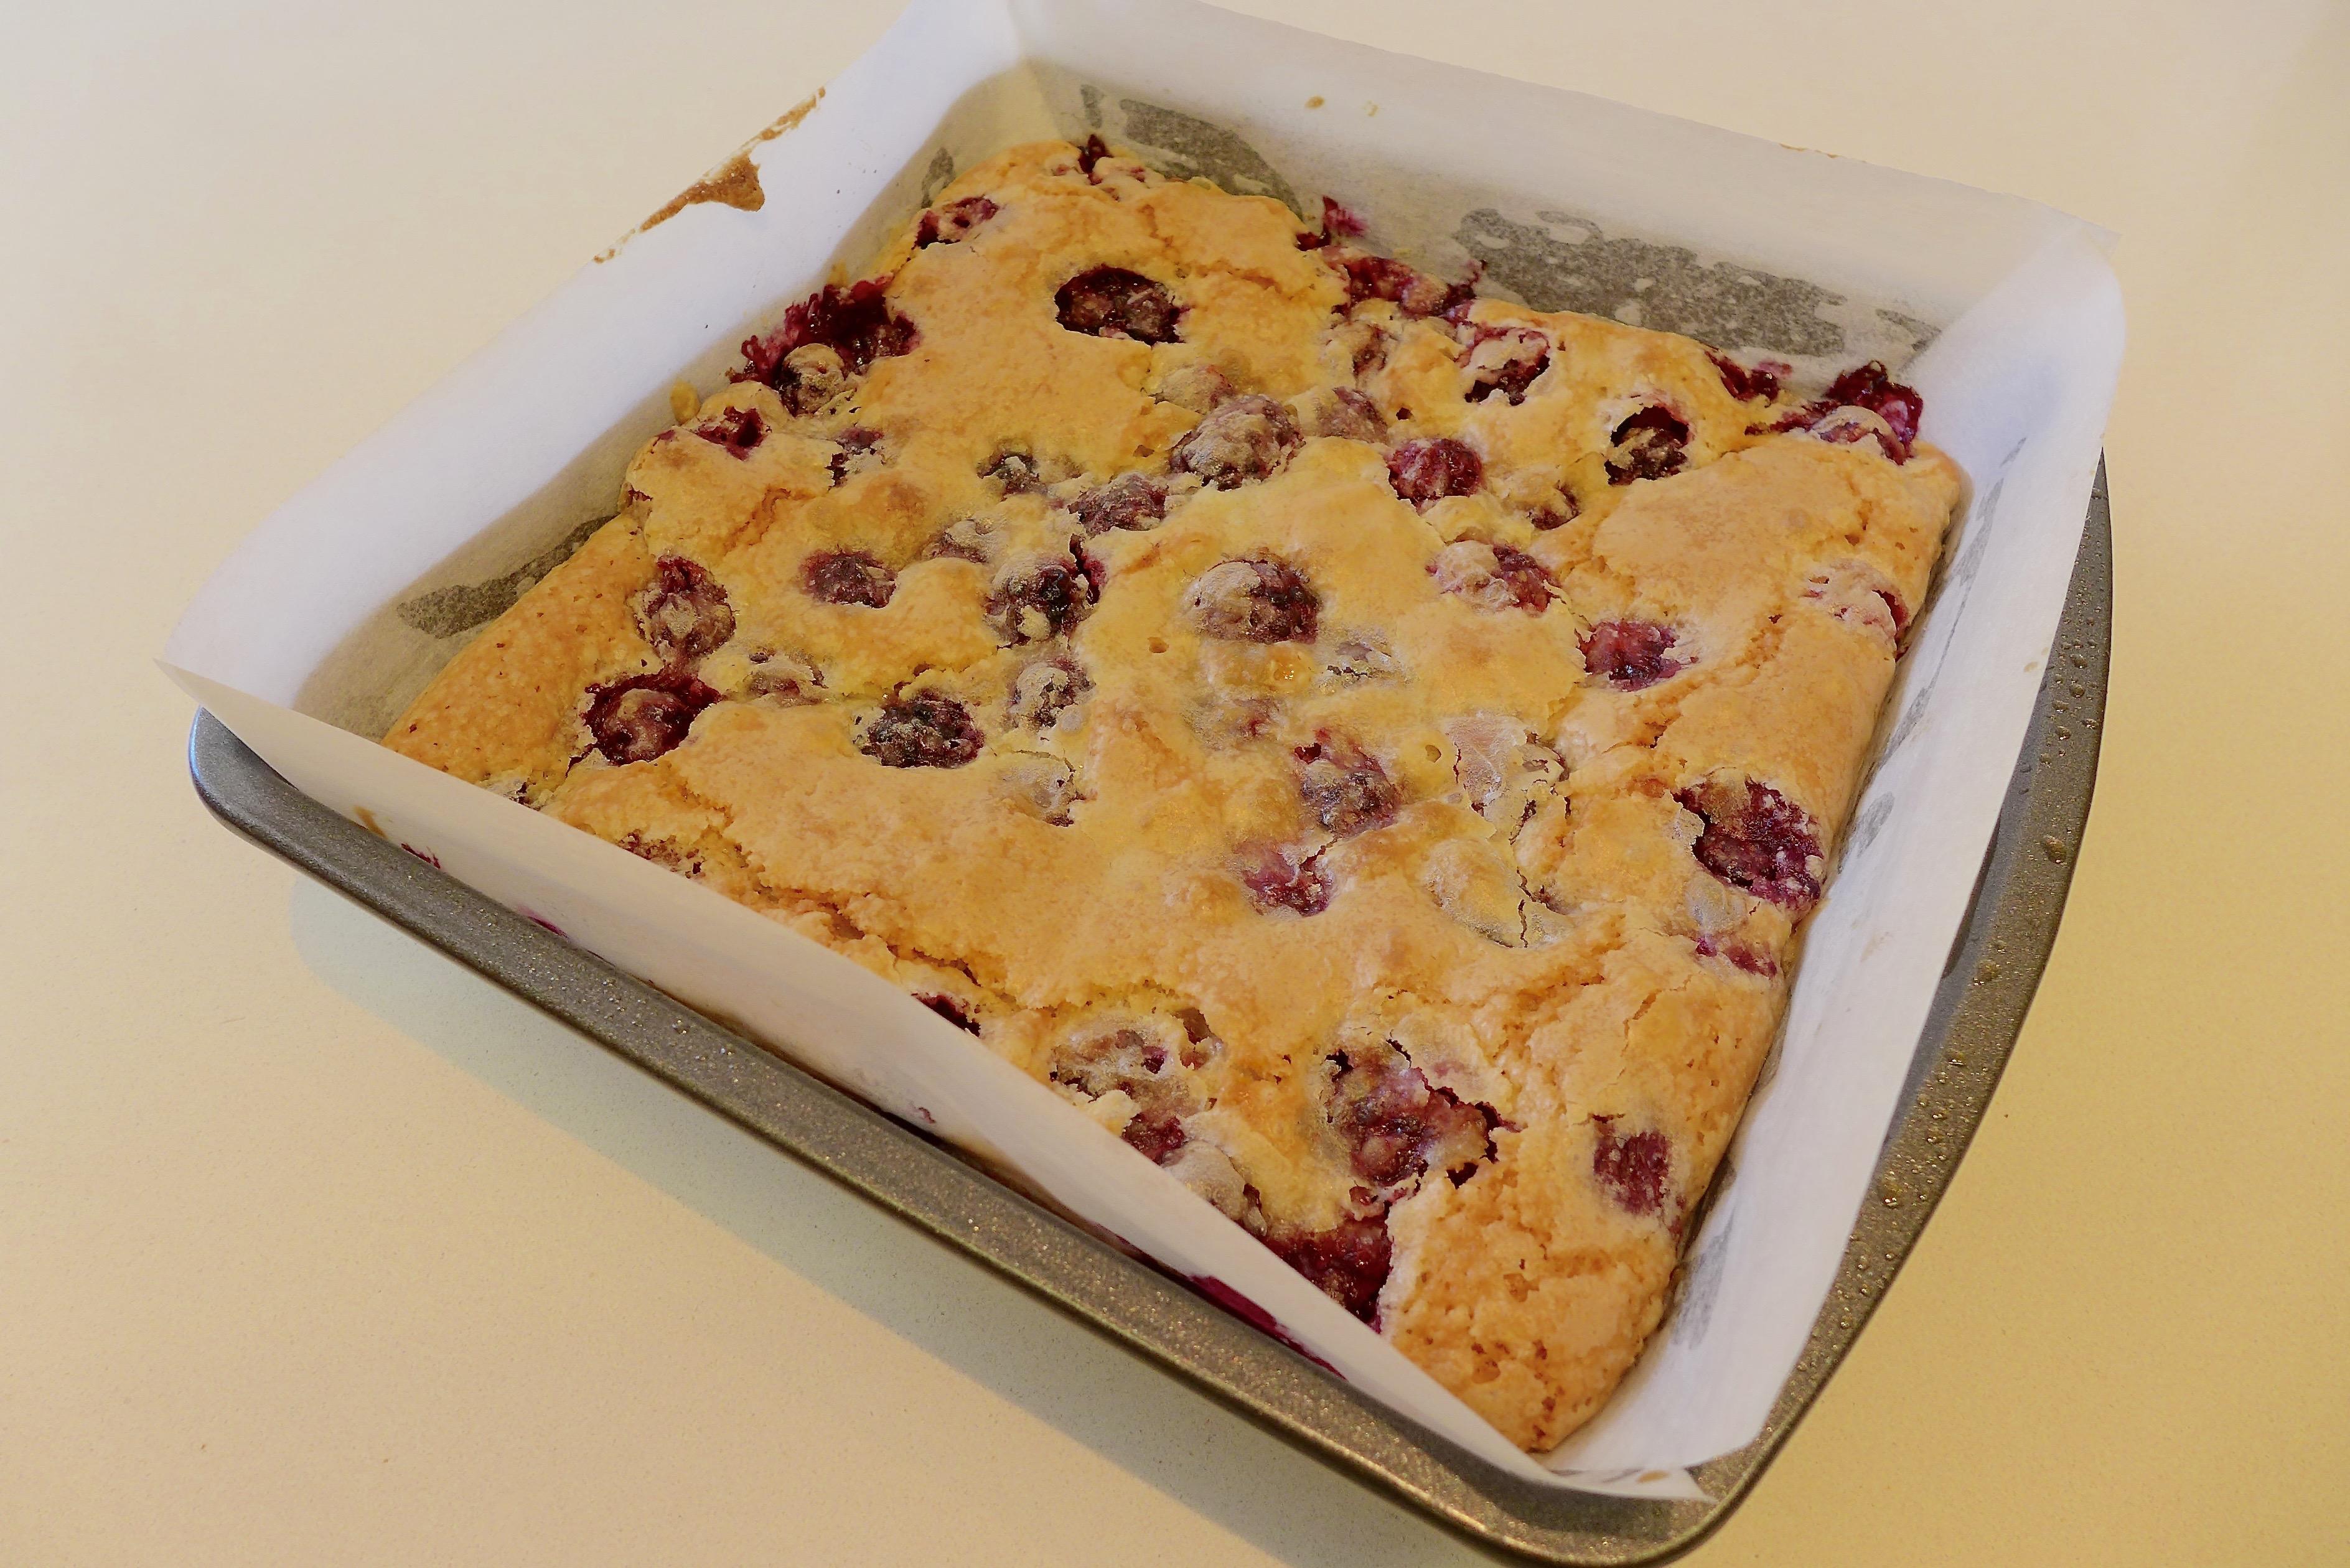 Raspberry and Blackberry Pie cake